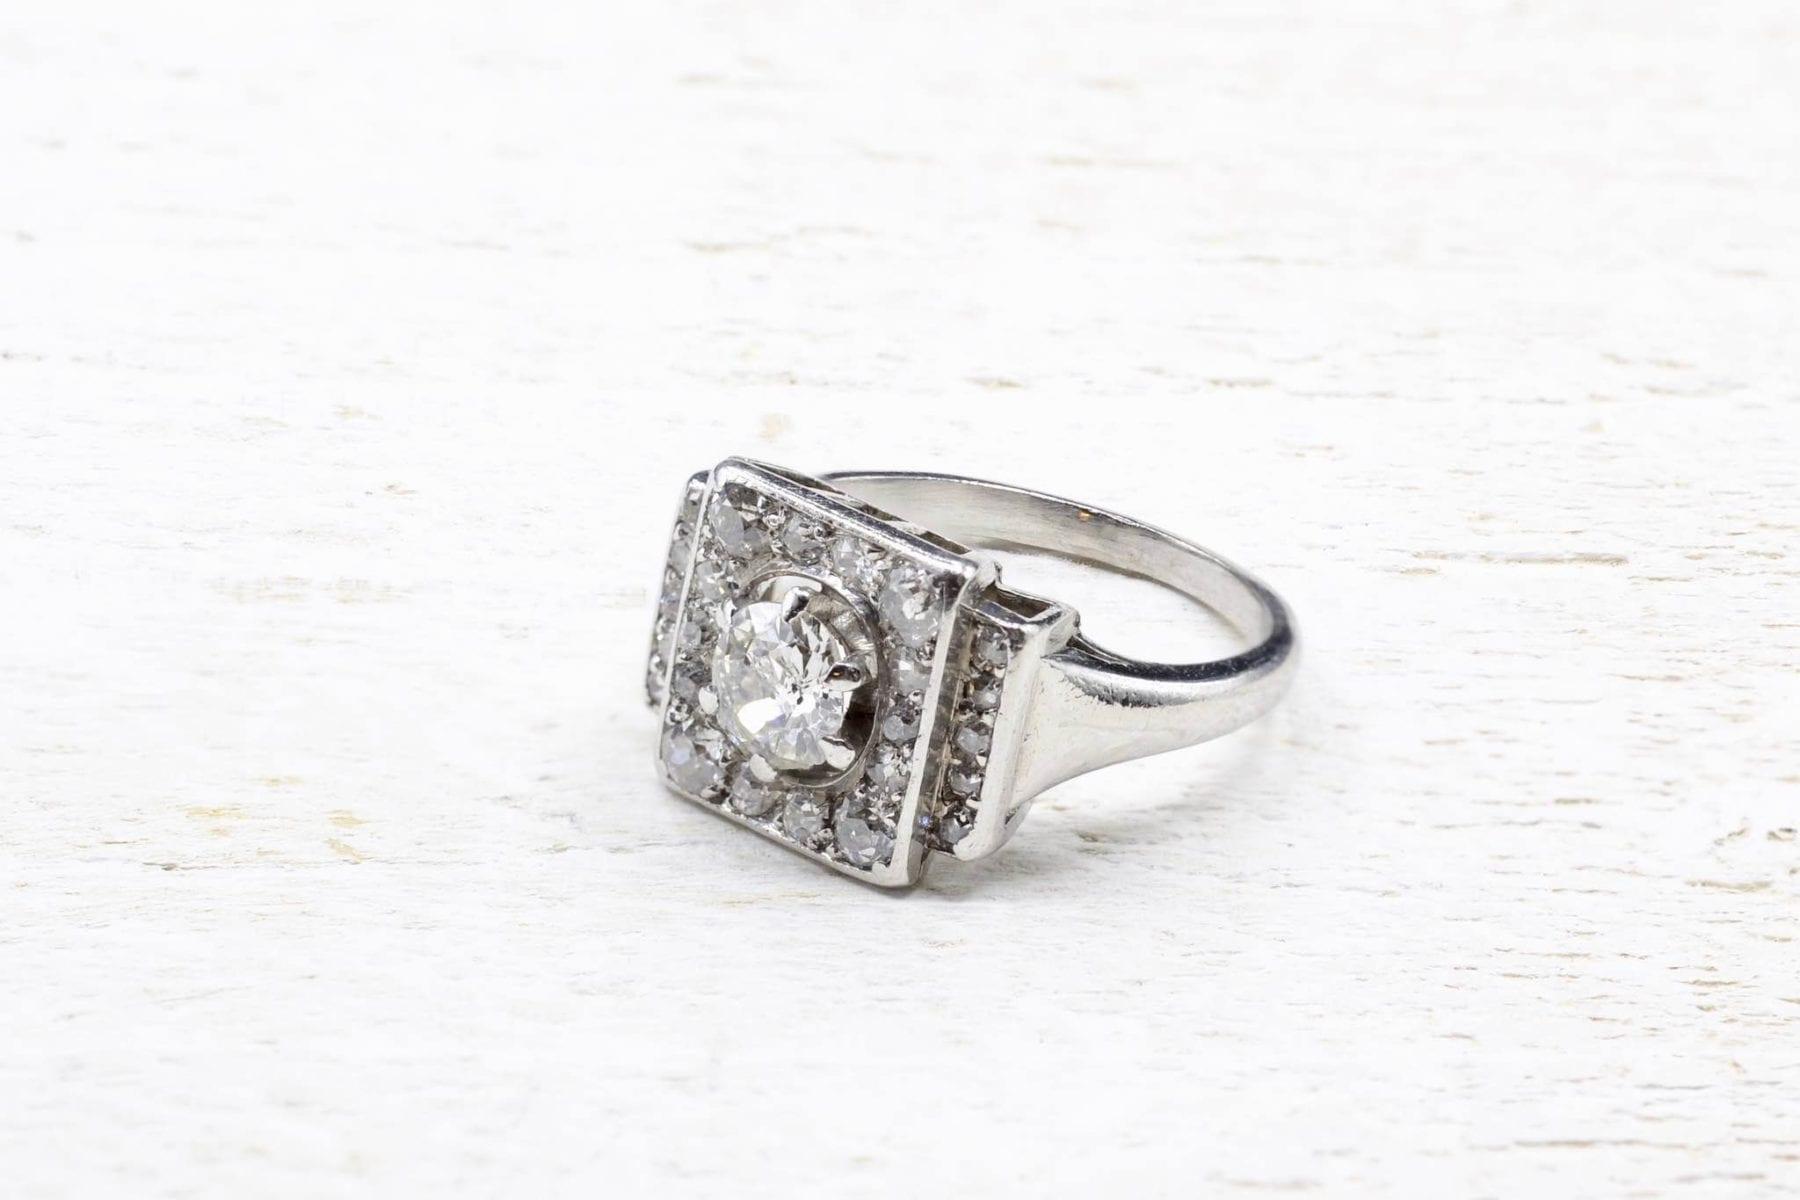 Bague diamants vintage en platine